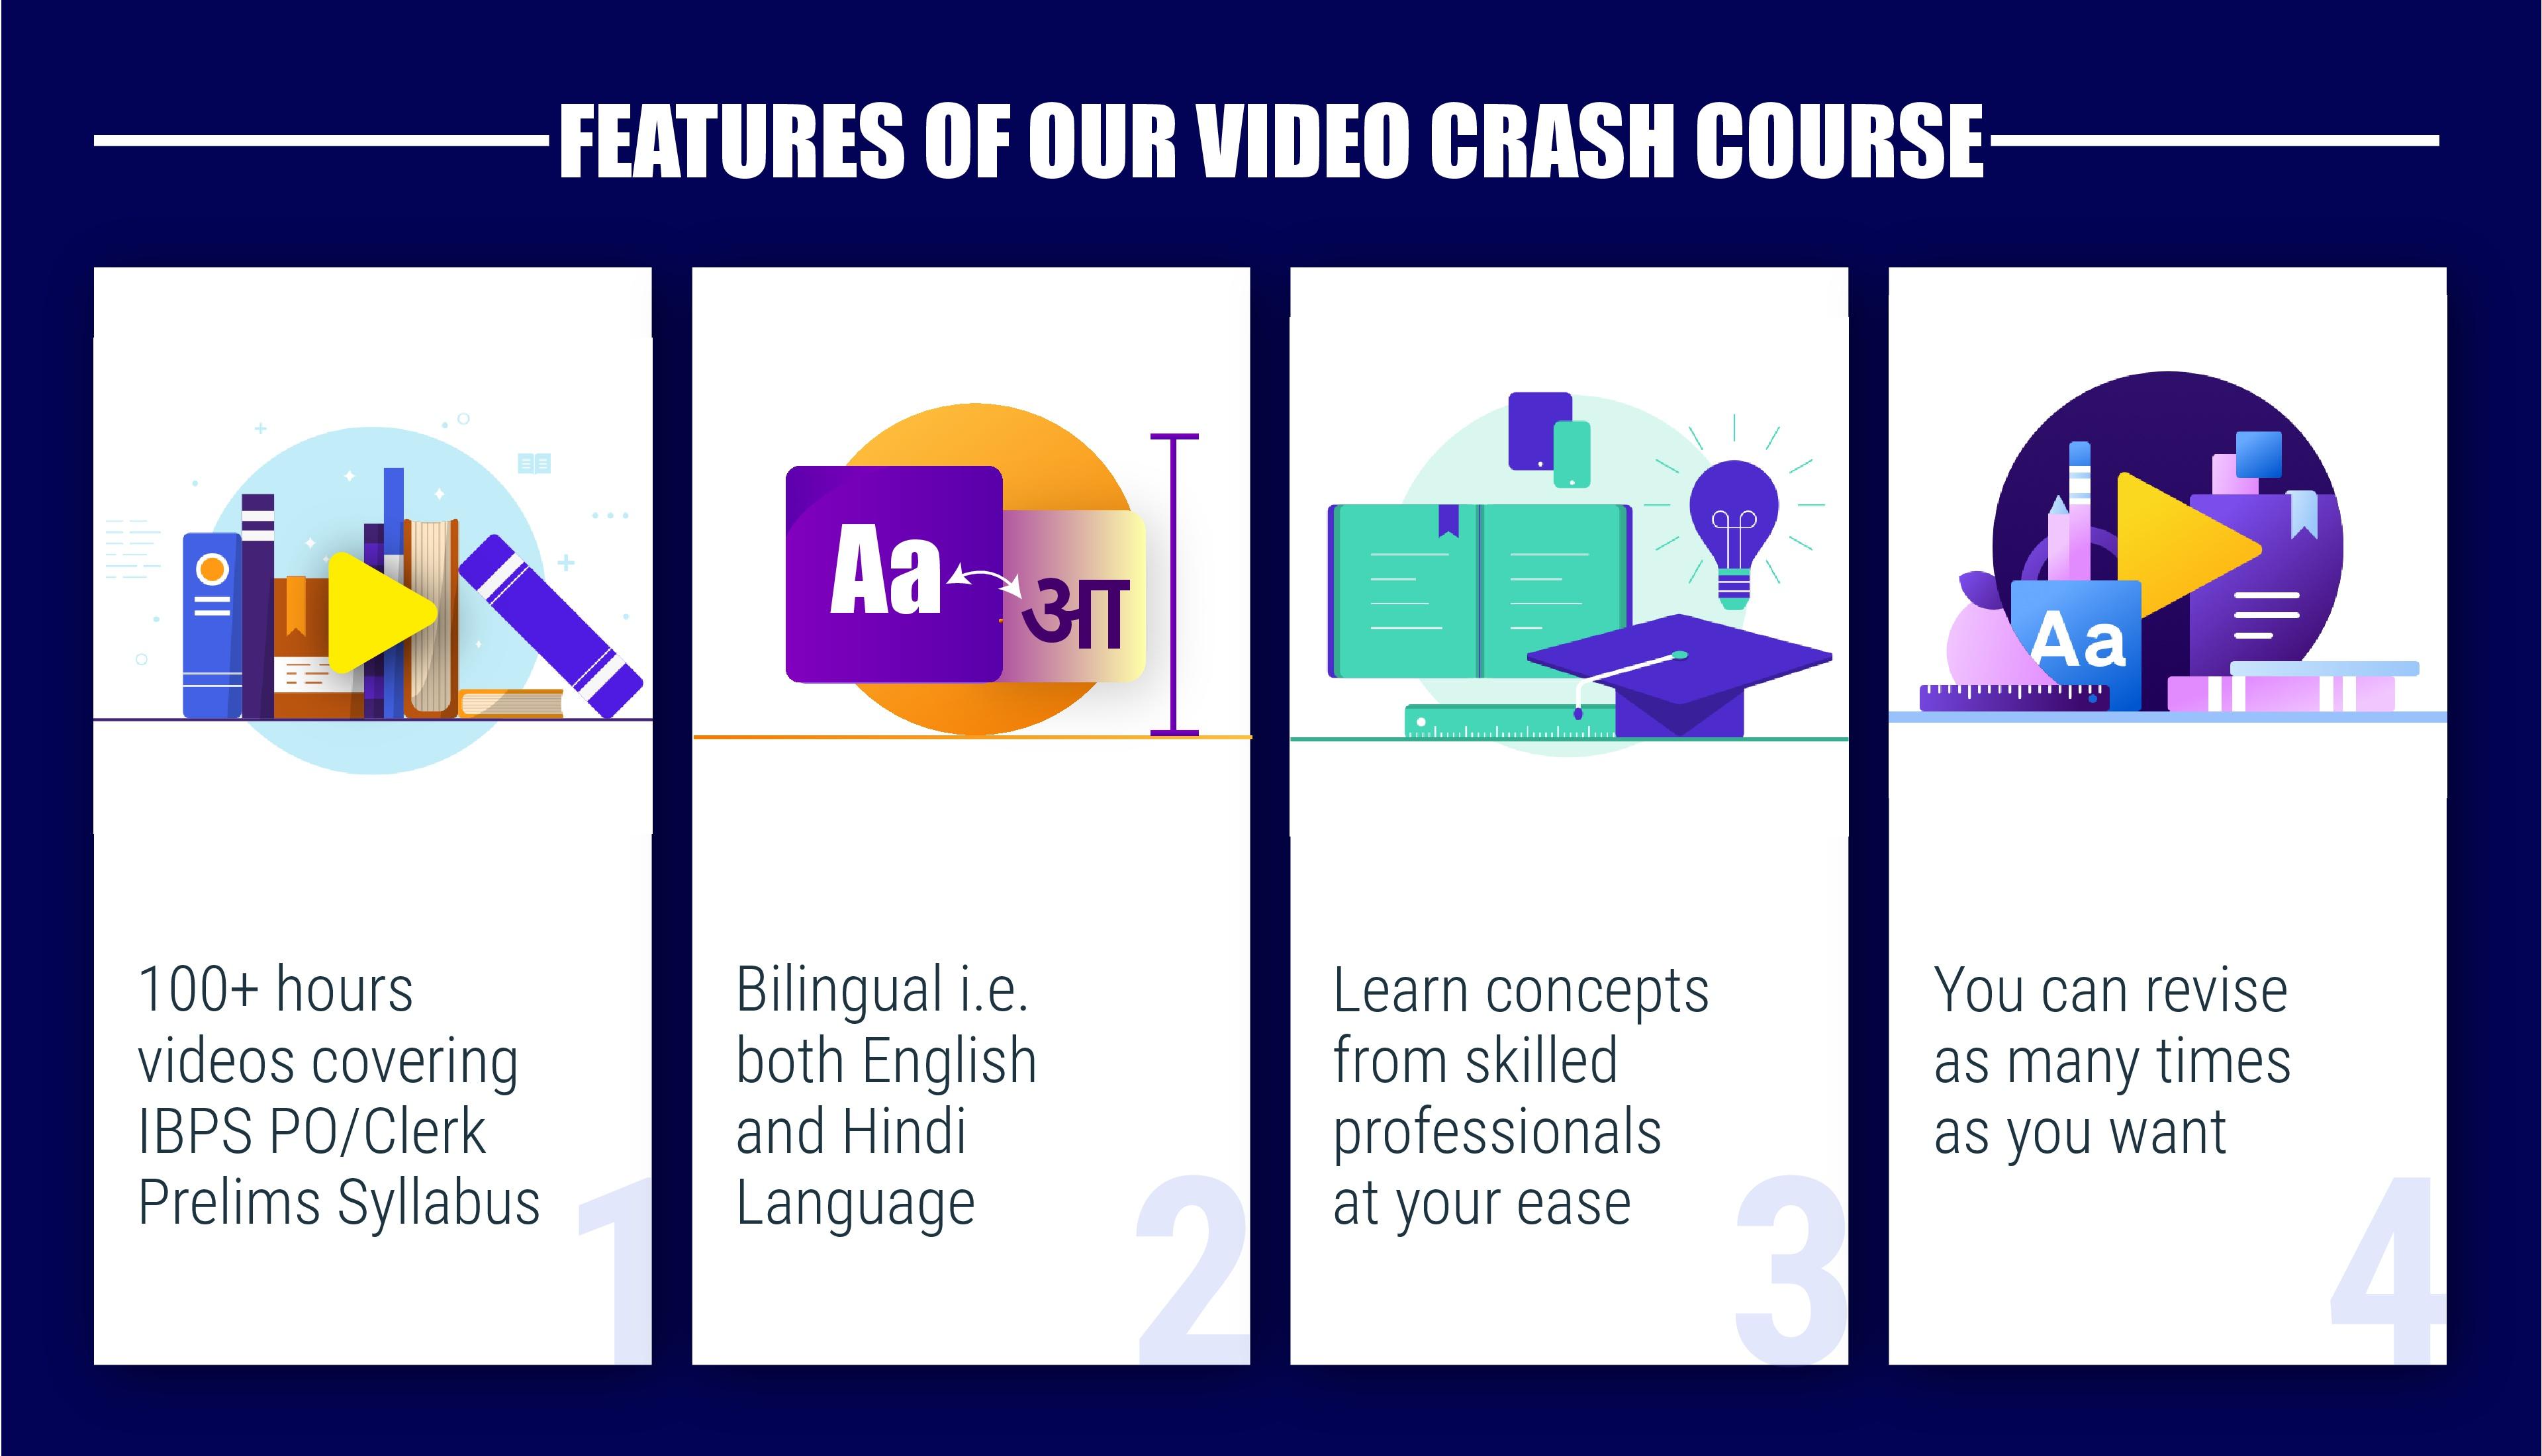 Online Video Crash Course for IBPS PO